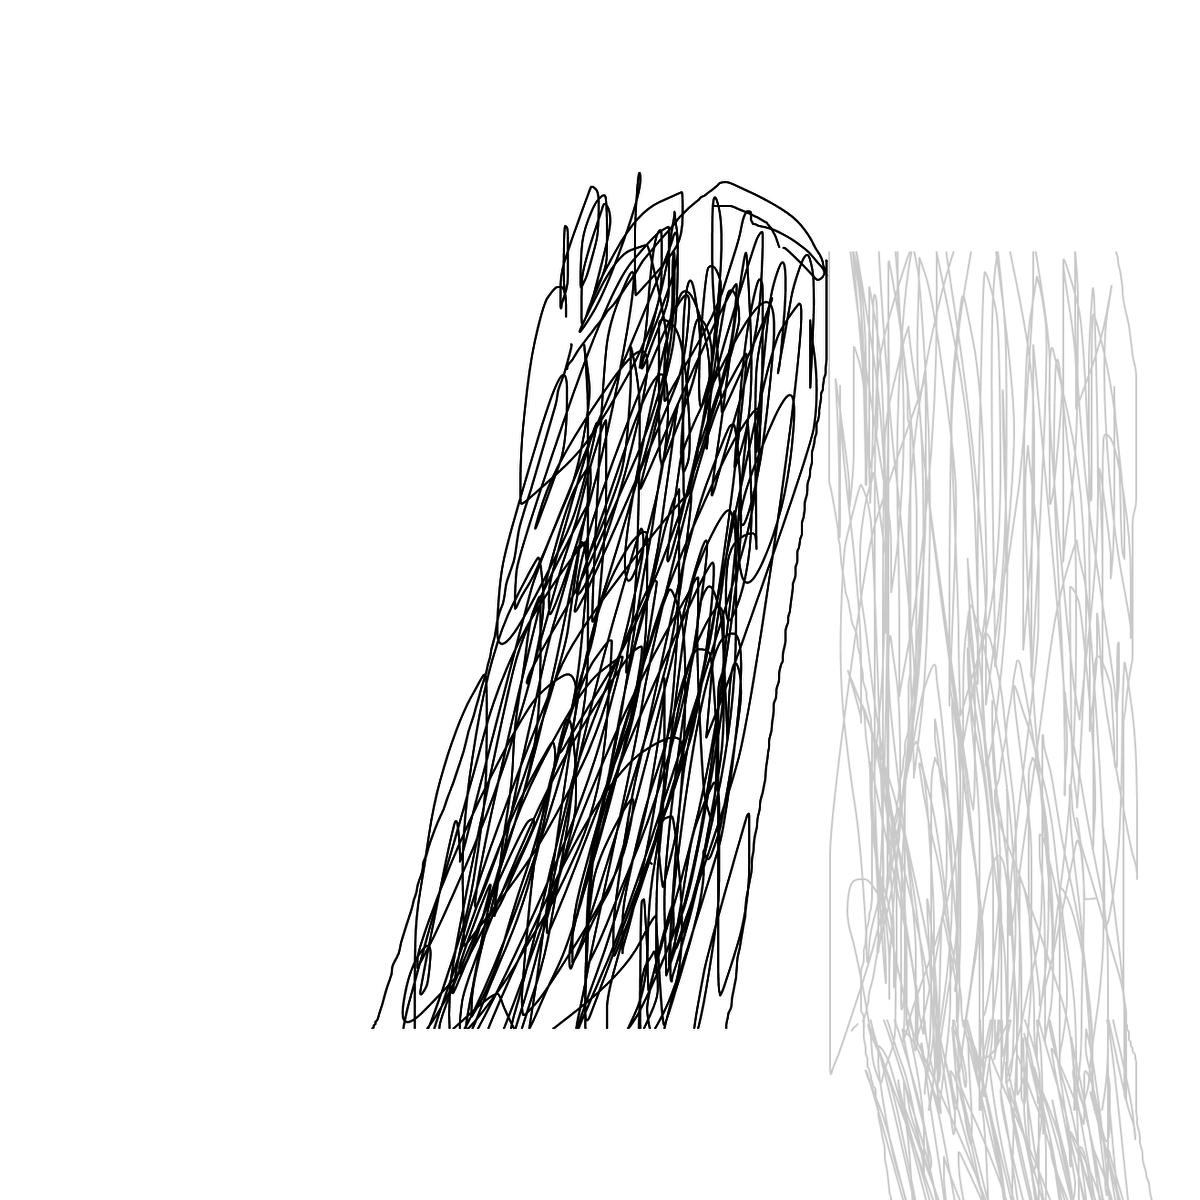 BAAAM drawing#11426 lat:52.4758872985839840lng: 13.4056425094604500